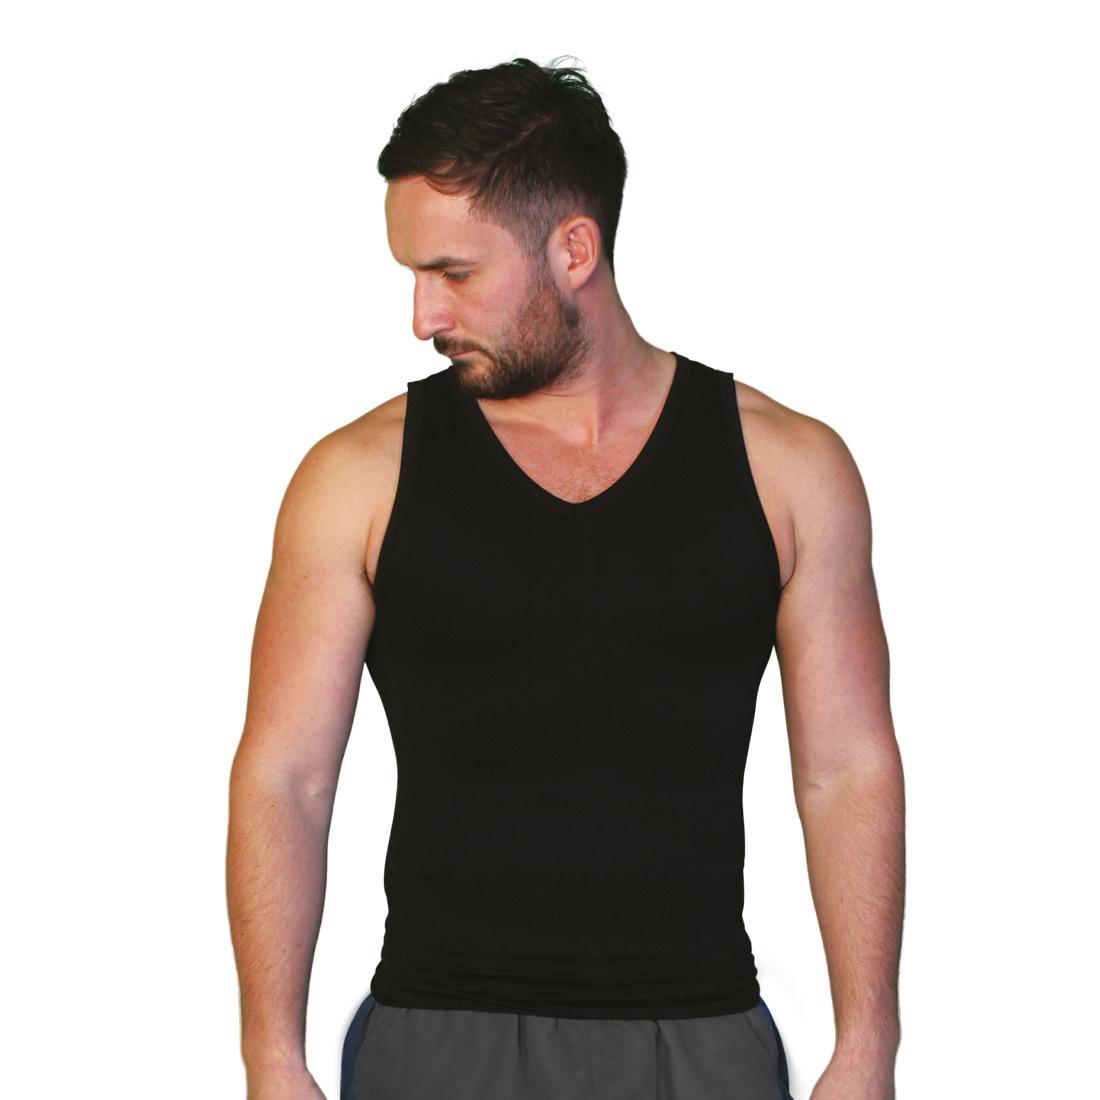 An image of Tone Tee Black Vest XXL